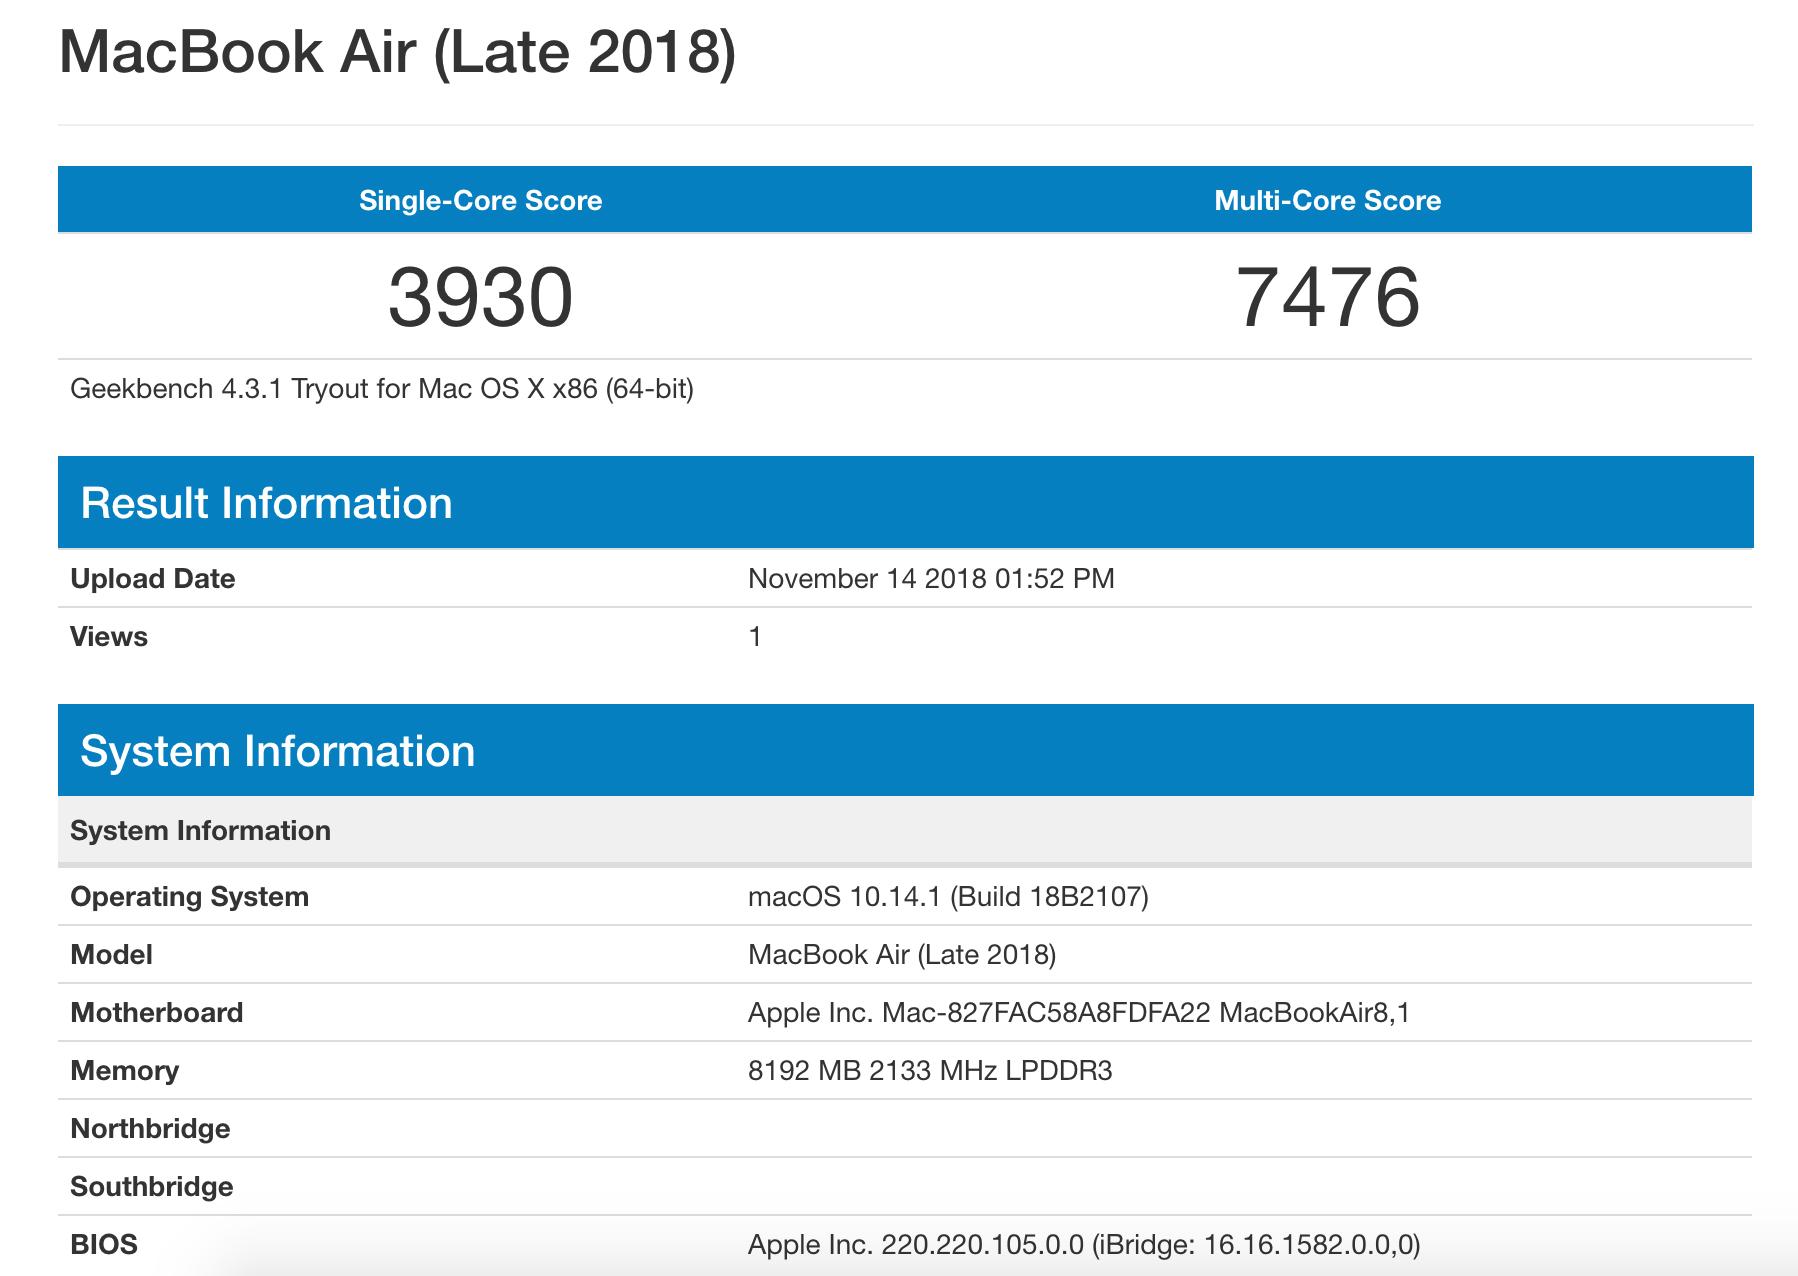 MacBook Air 2018 Geekbench score